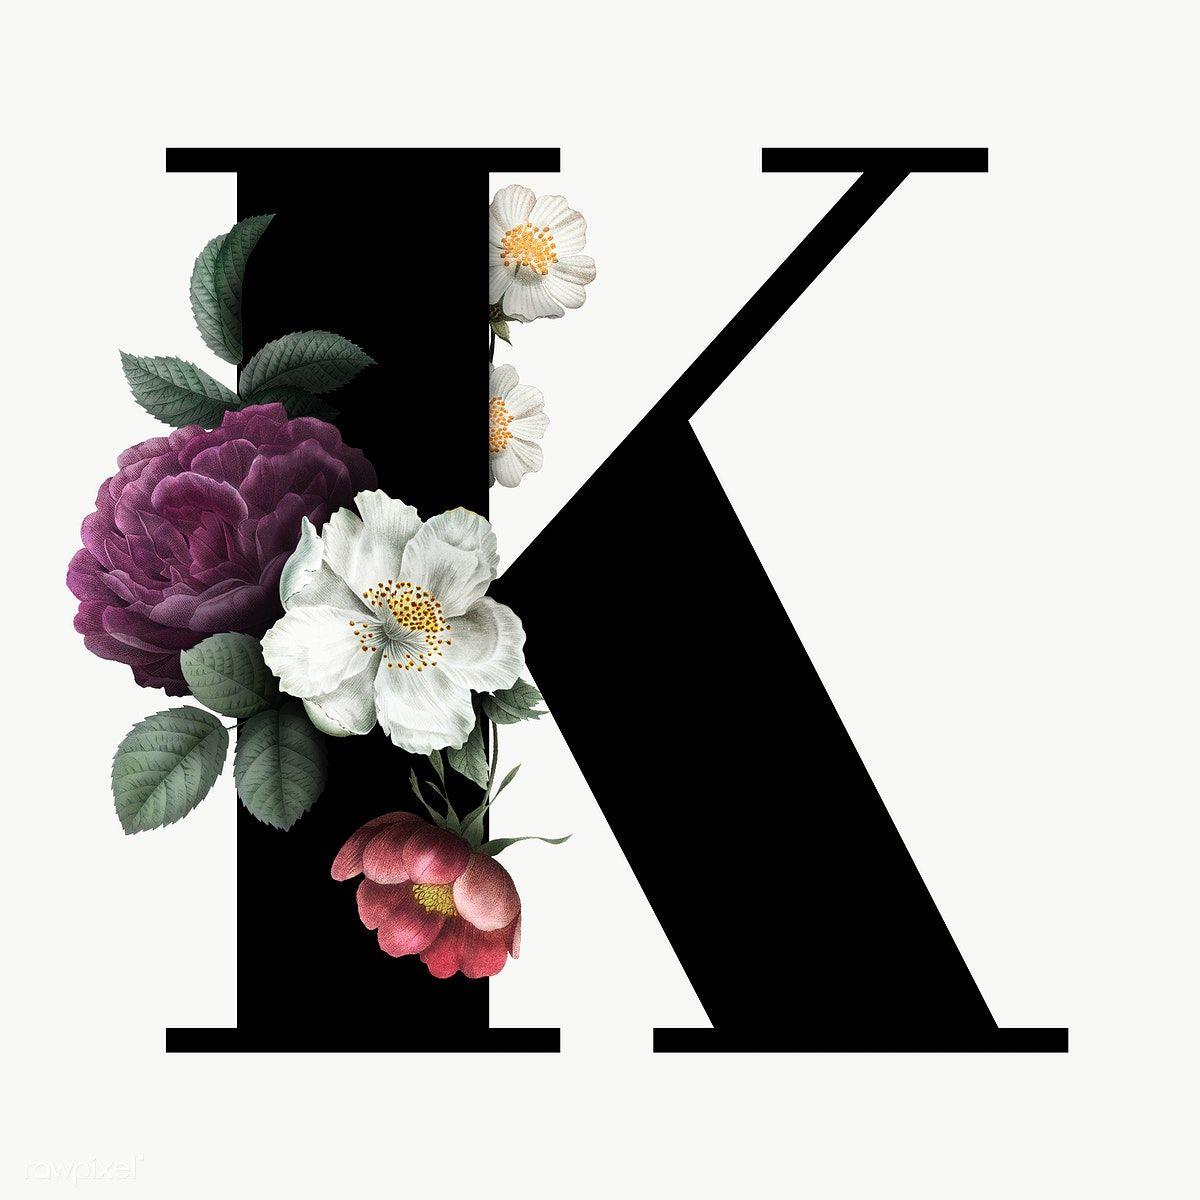 Classic And Elegant Floral Alphabet Font Letter K Transparent Png Free Image By Rawpixel Com Lettering Alphabet Fonts Lettering Fonts Fonts Alphabet